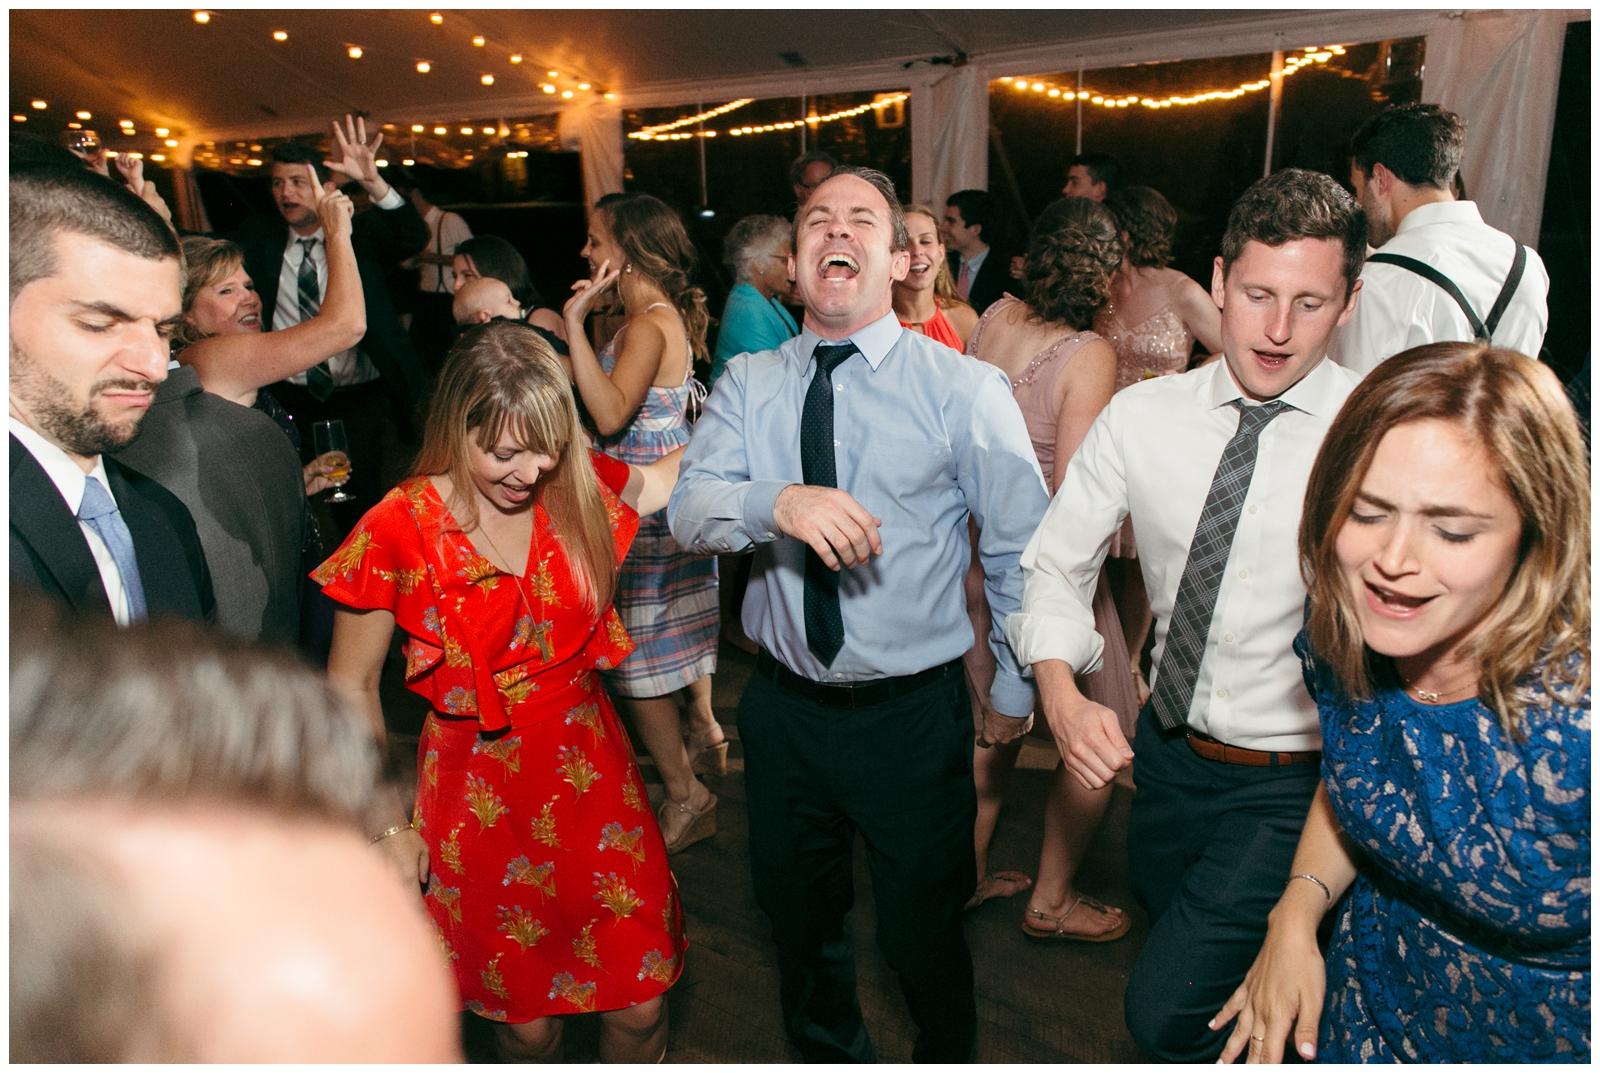 Moraine-Farm-wedding-Bailey-Q-Photo-Massachusetts-wedding-photpgrapher-160.jpg